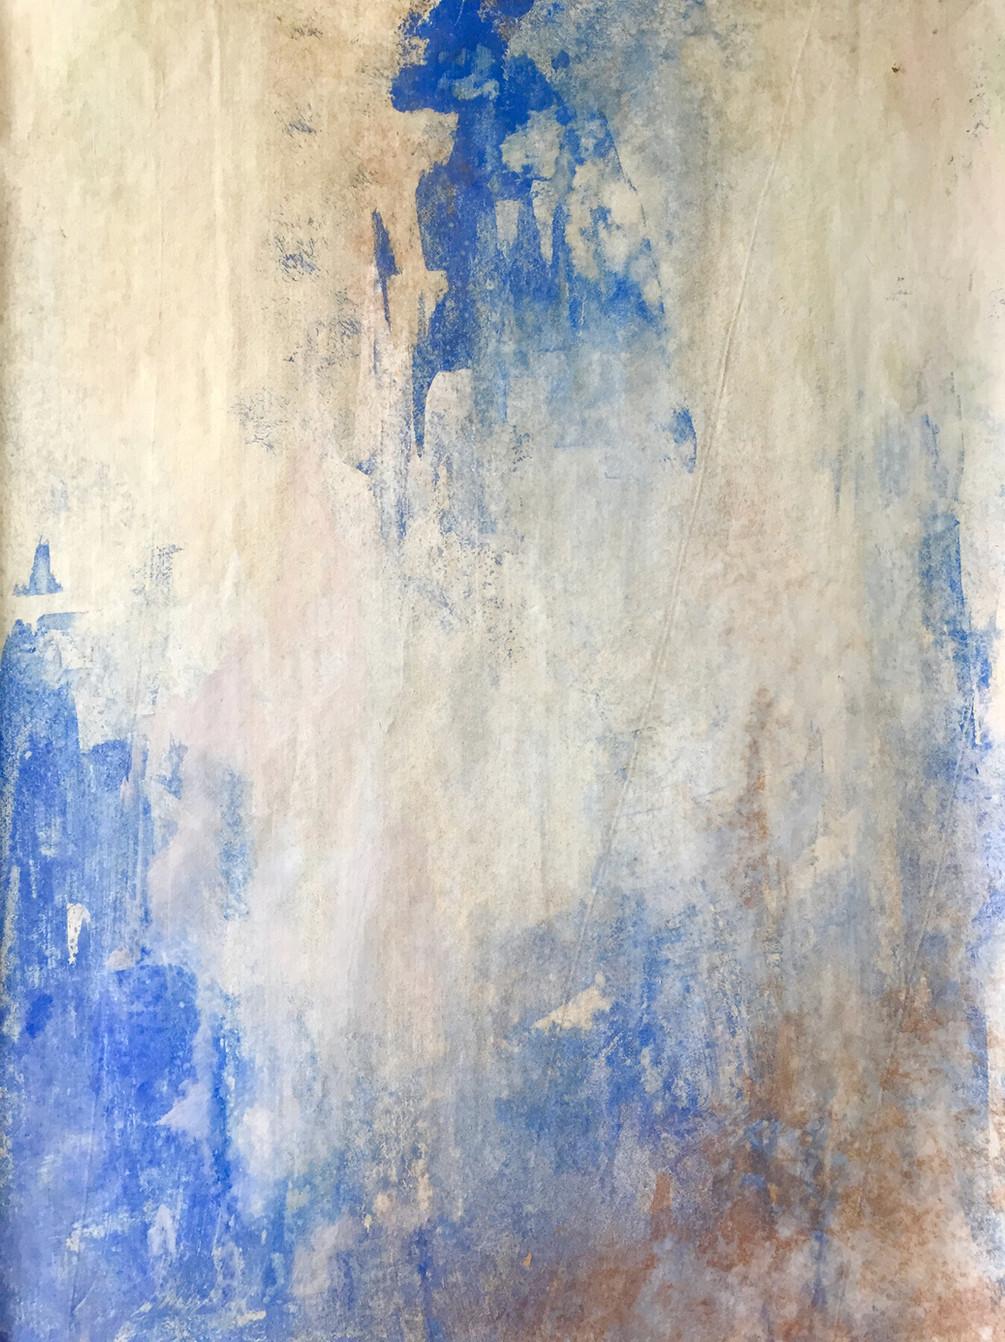 Cobalt blue distressed effect